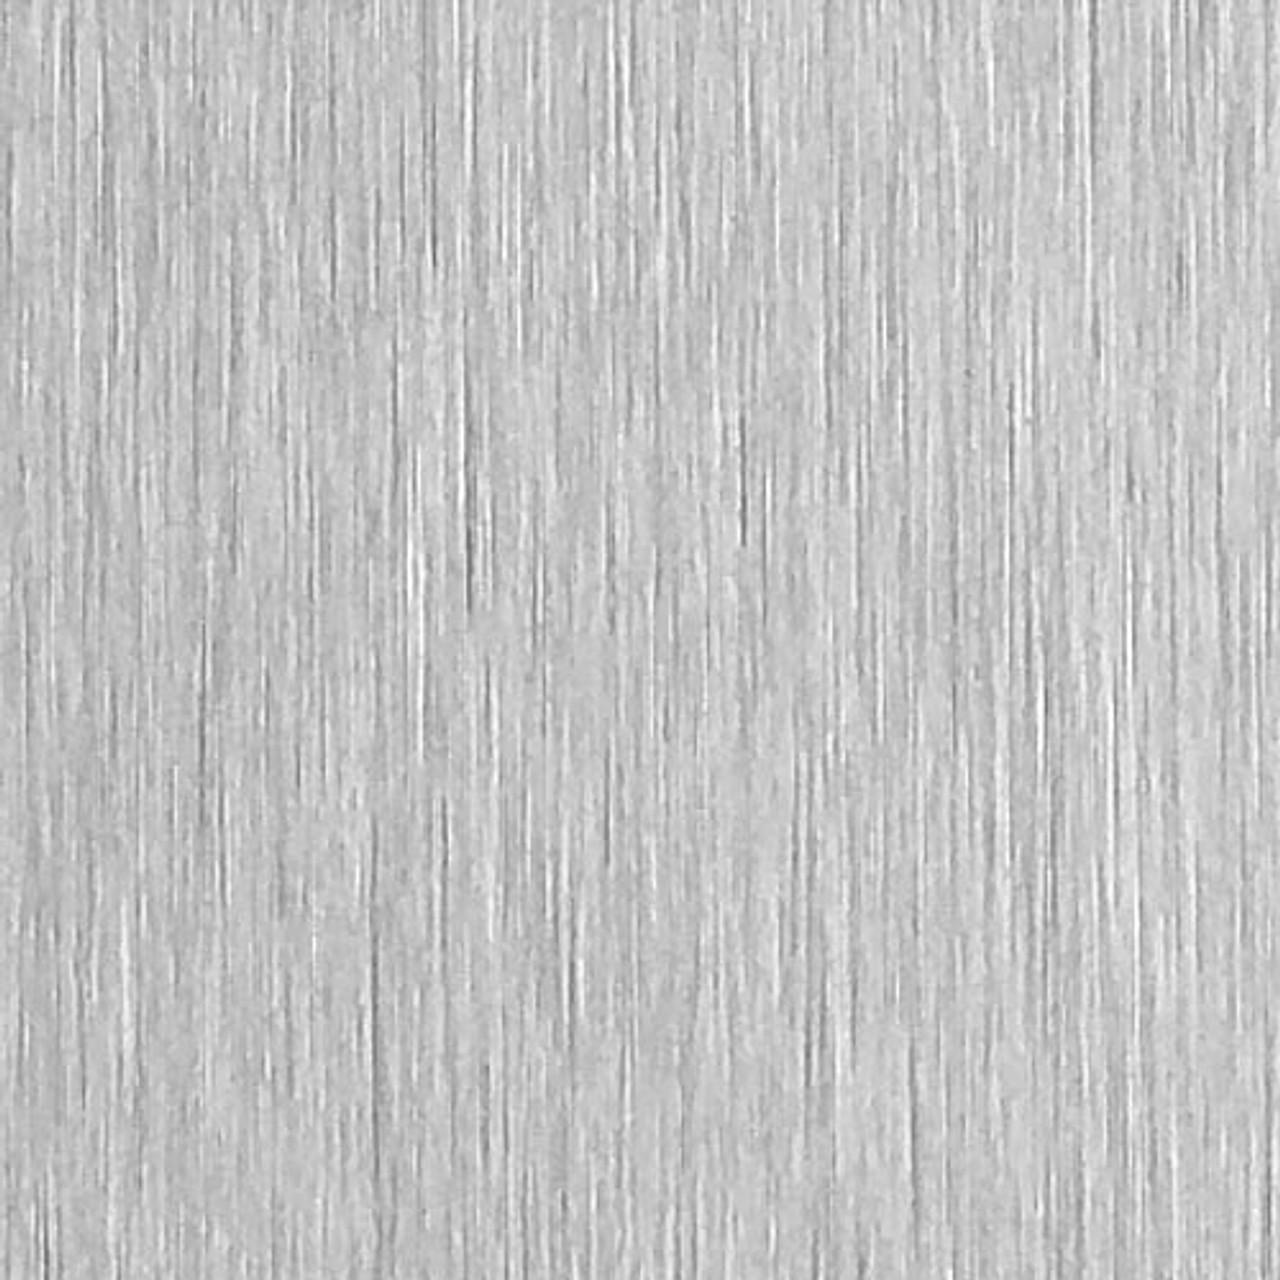 Formica Brushed Aluminum  4' x 8'